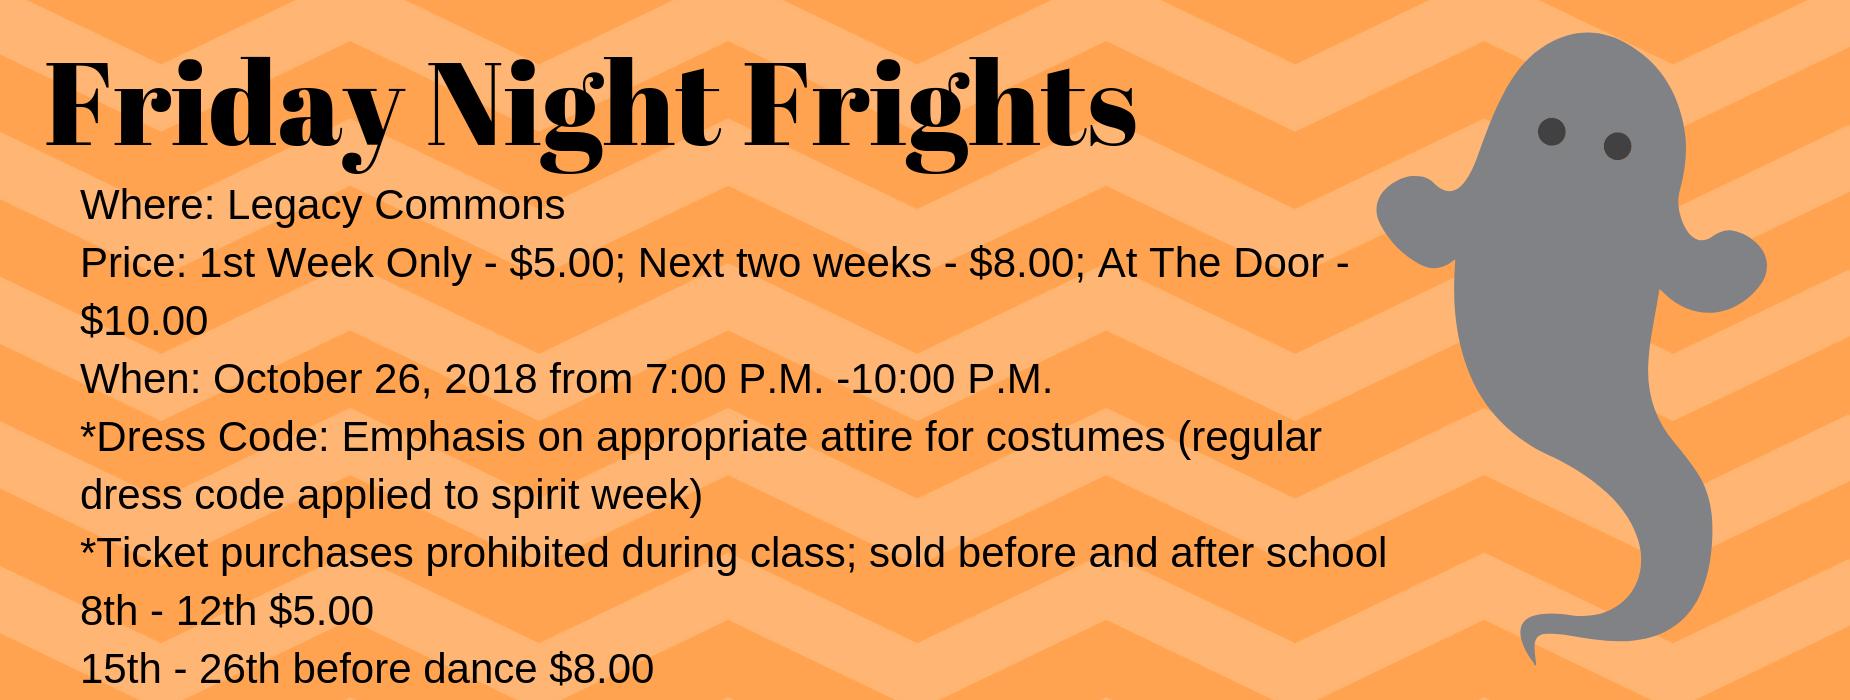 Halloween Dance 10/26 7-10 pm at LECHS